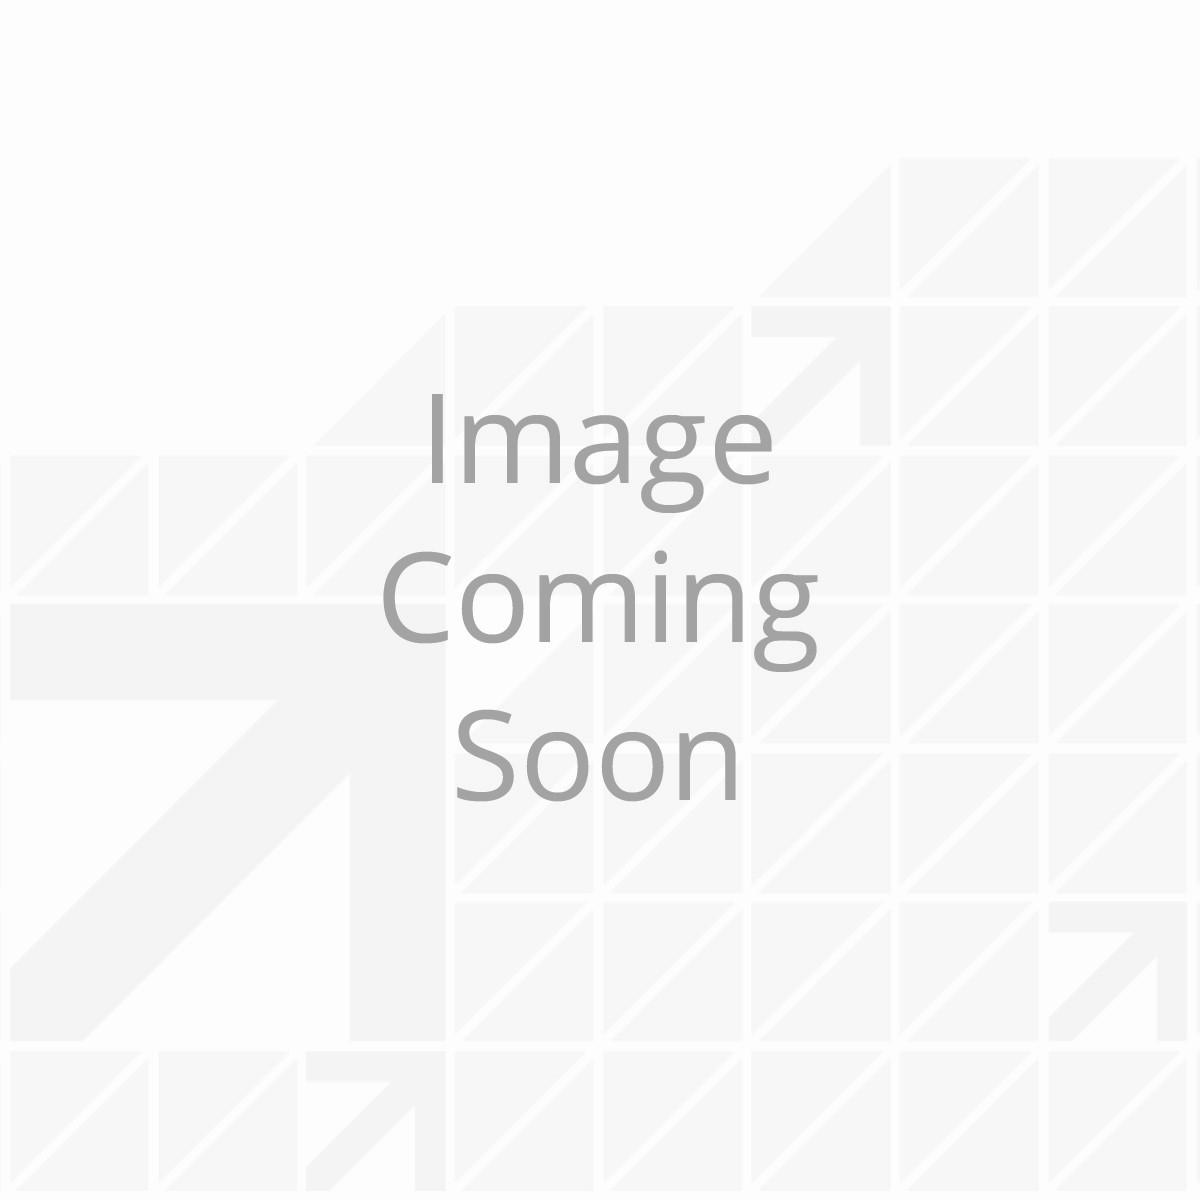 14.5 BTU Rooftop Air Conditioner, White